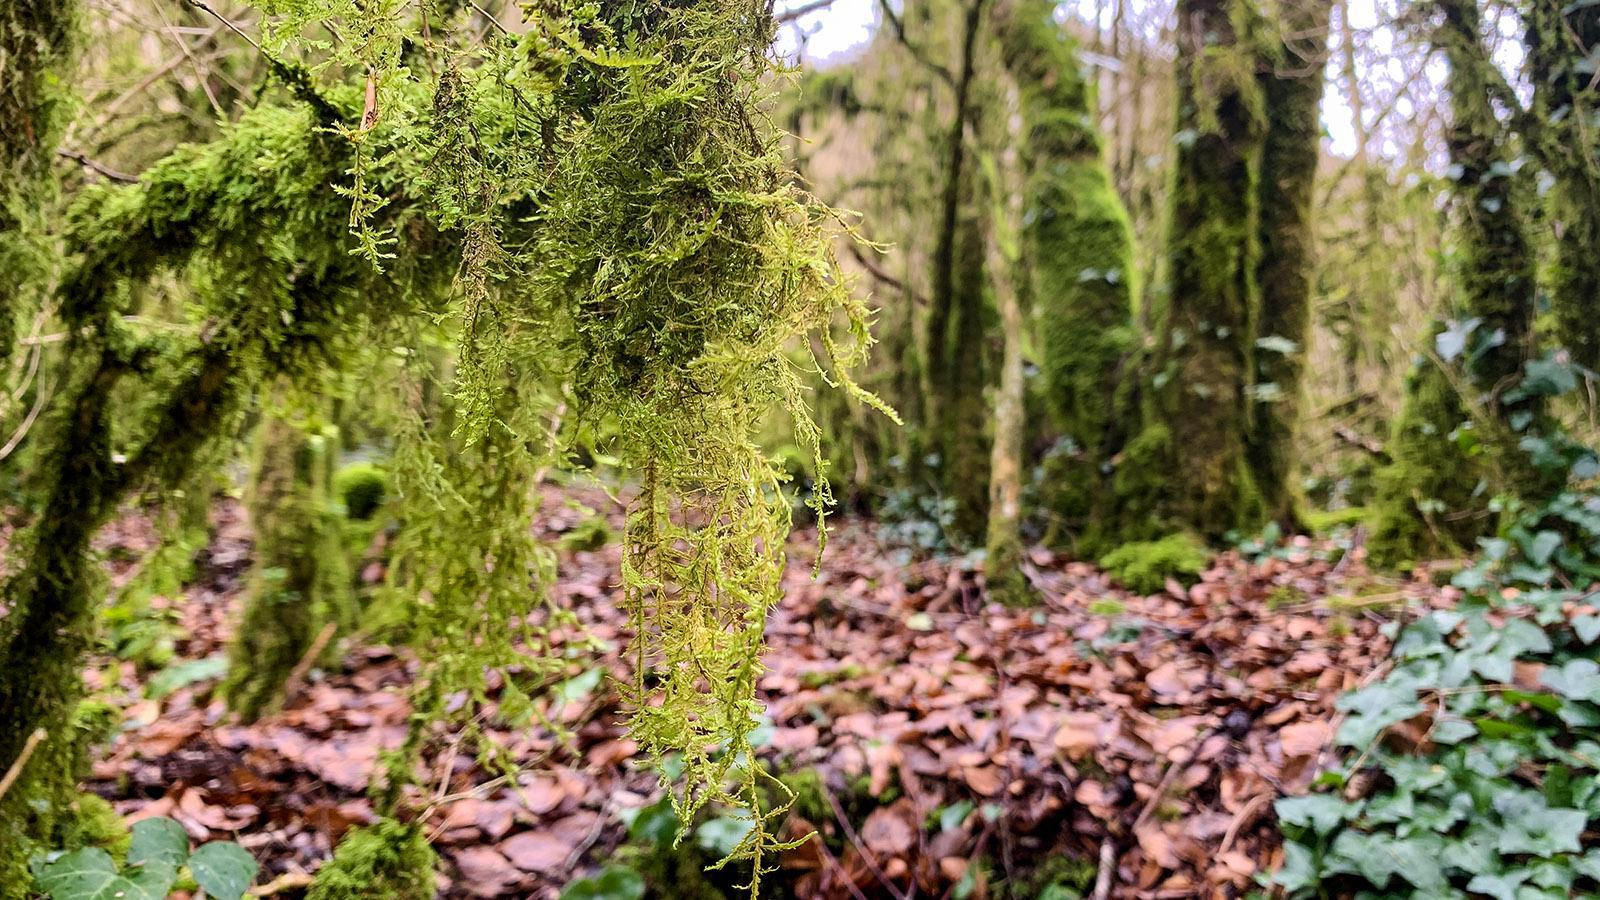 Sals: Mythisch - der Wald der Domaine de l'Eau Salée. Foto: Hilke Maunder